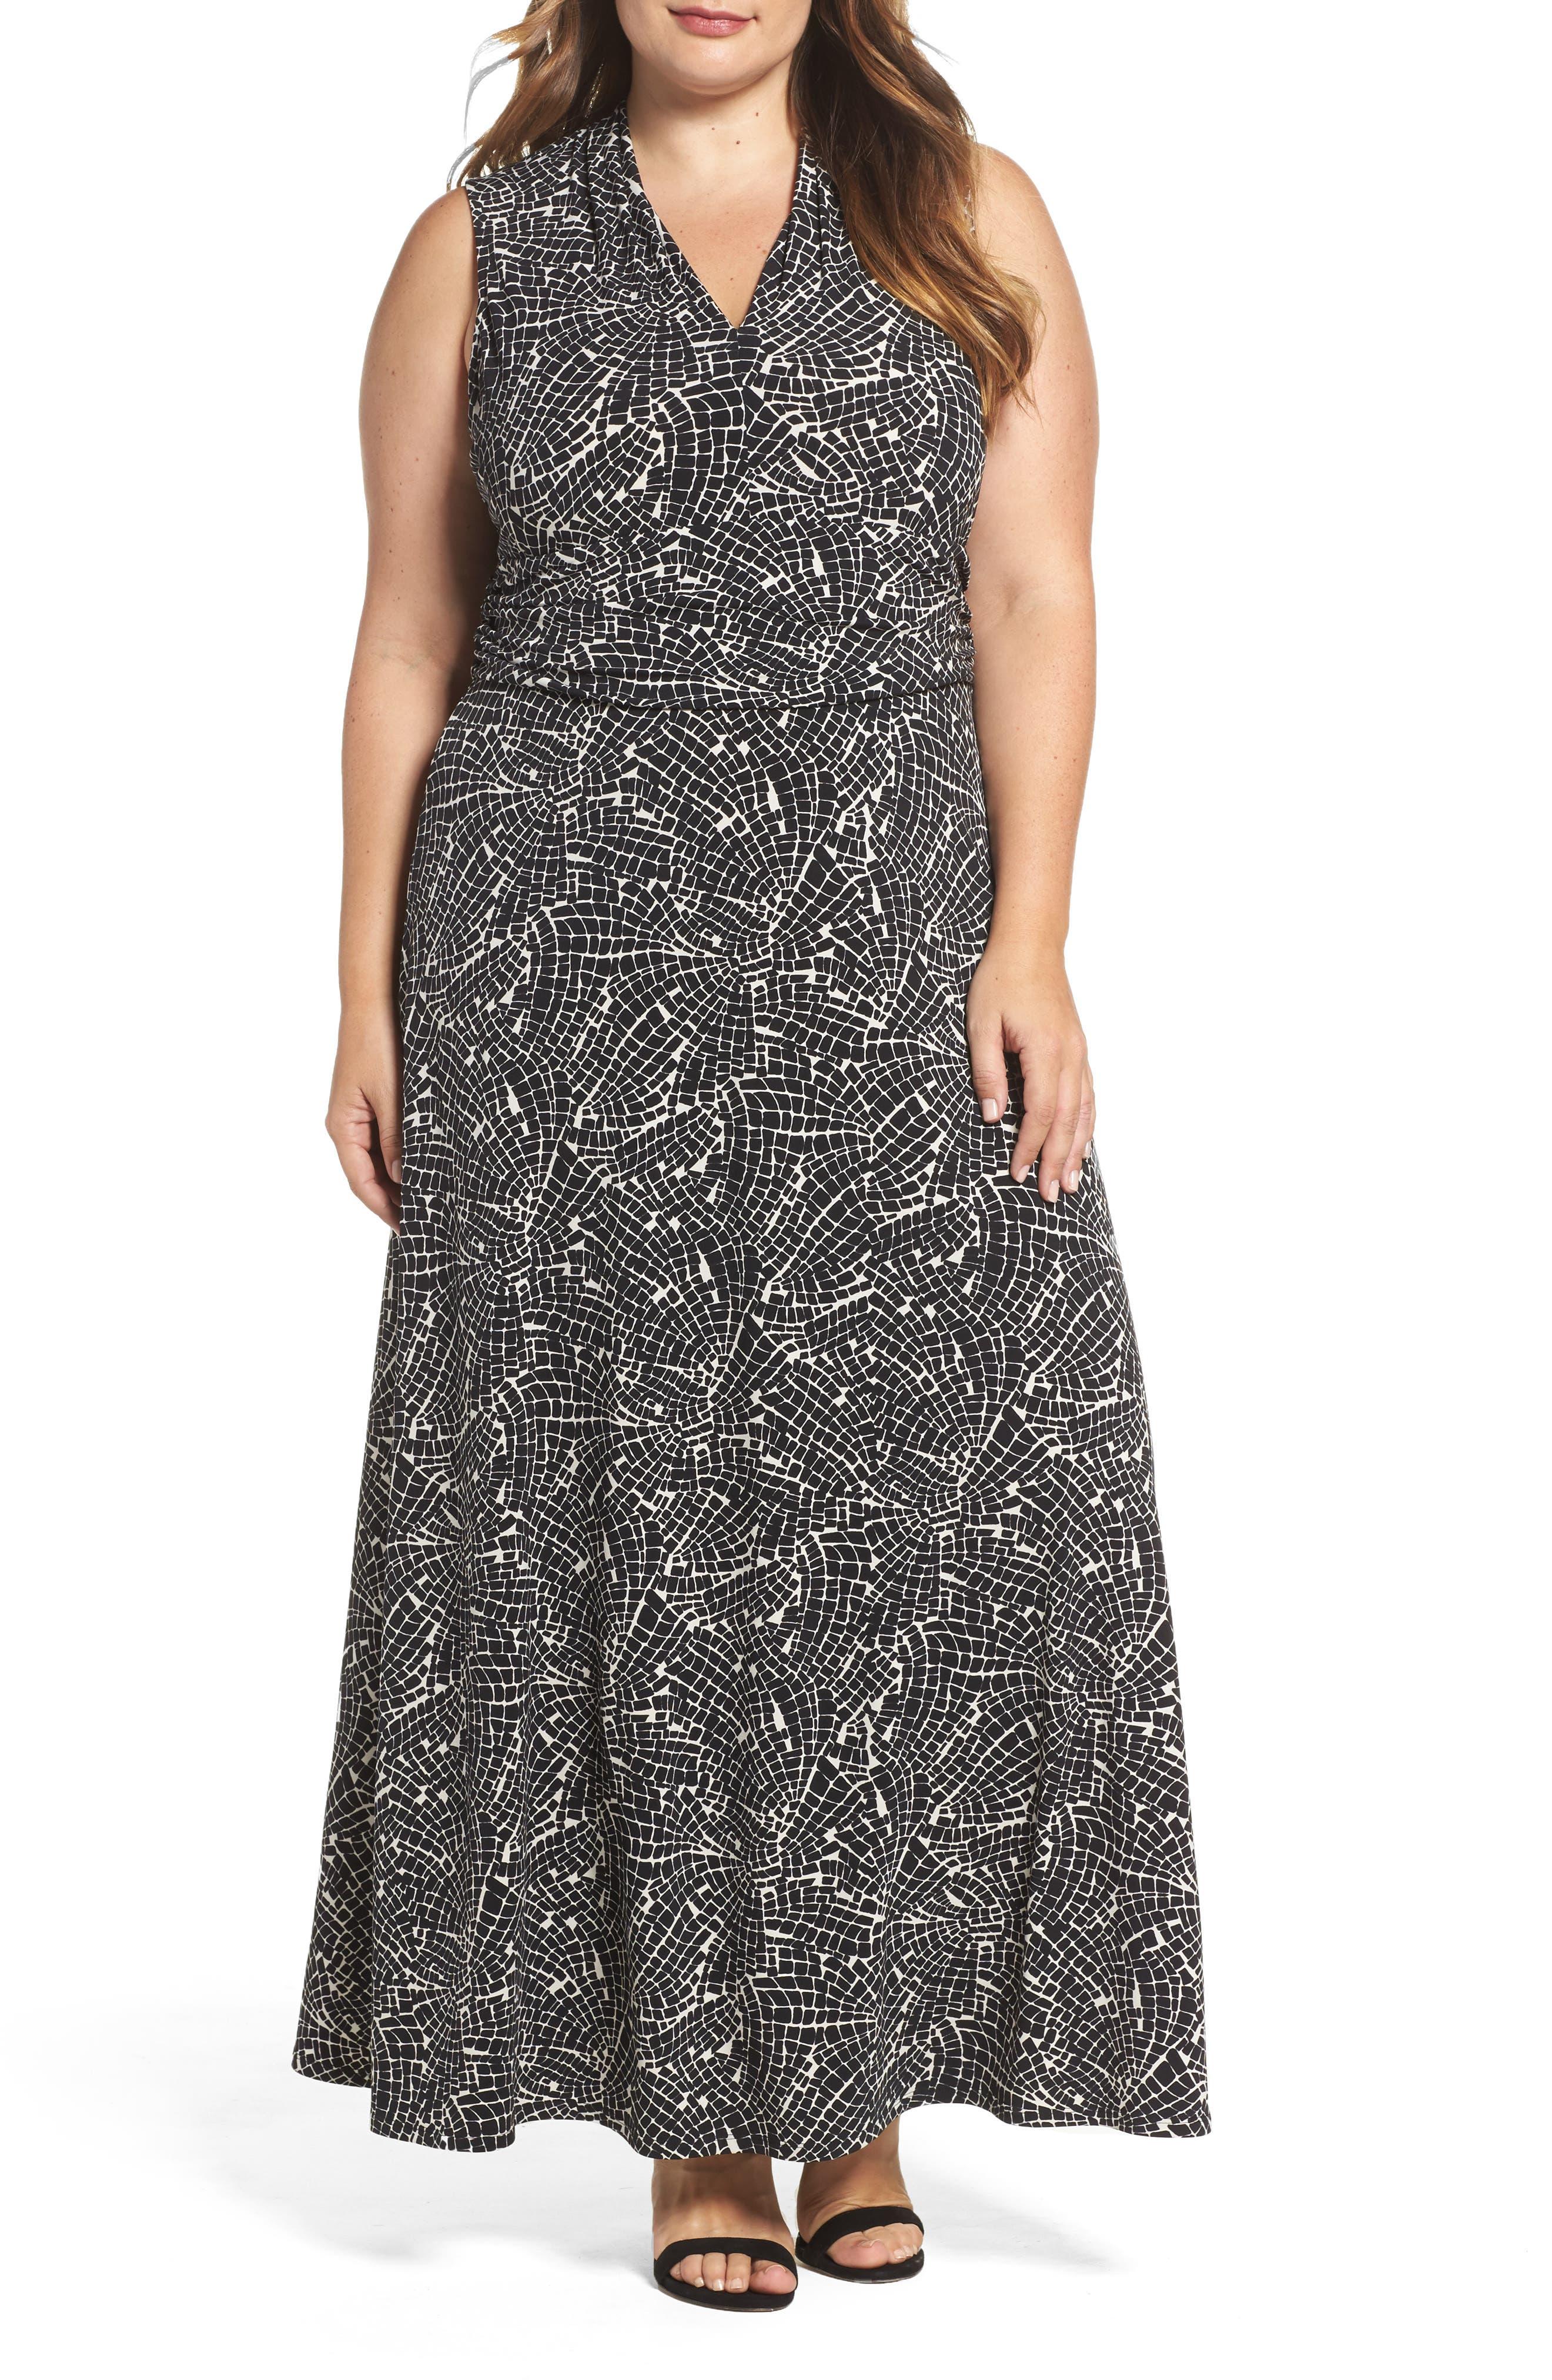 Modern Mosaic Maxi Dress,                             Main thumbnail 1, color,                             001